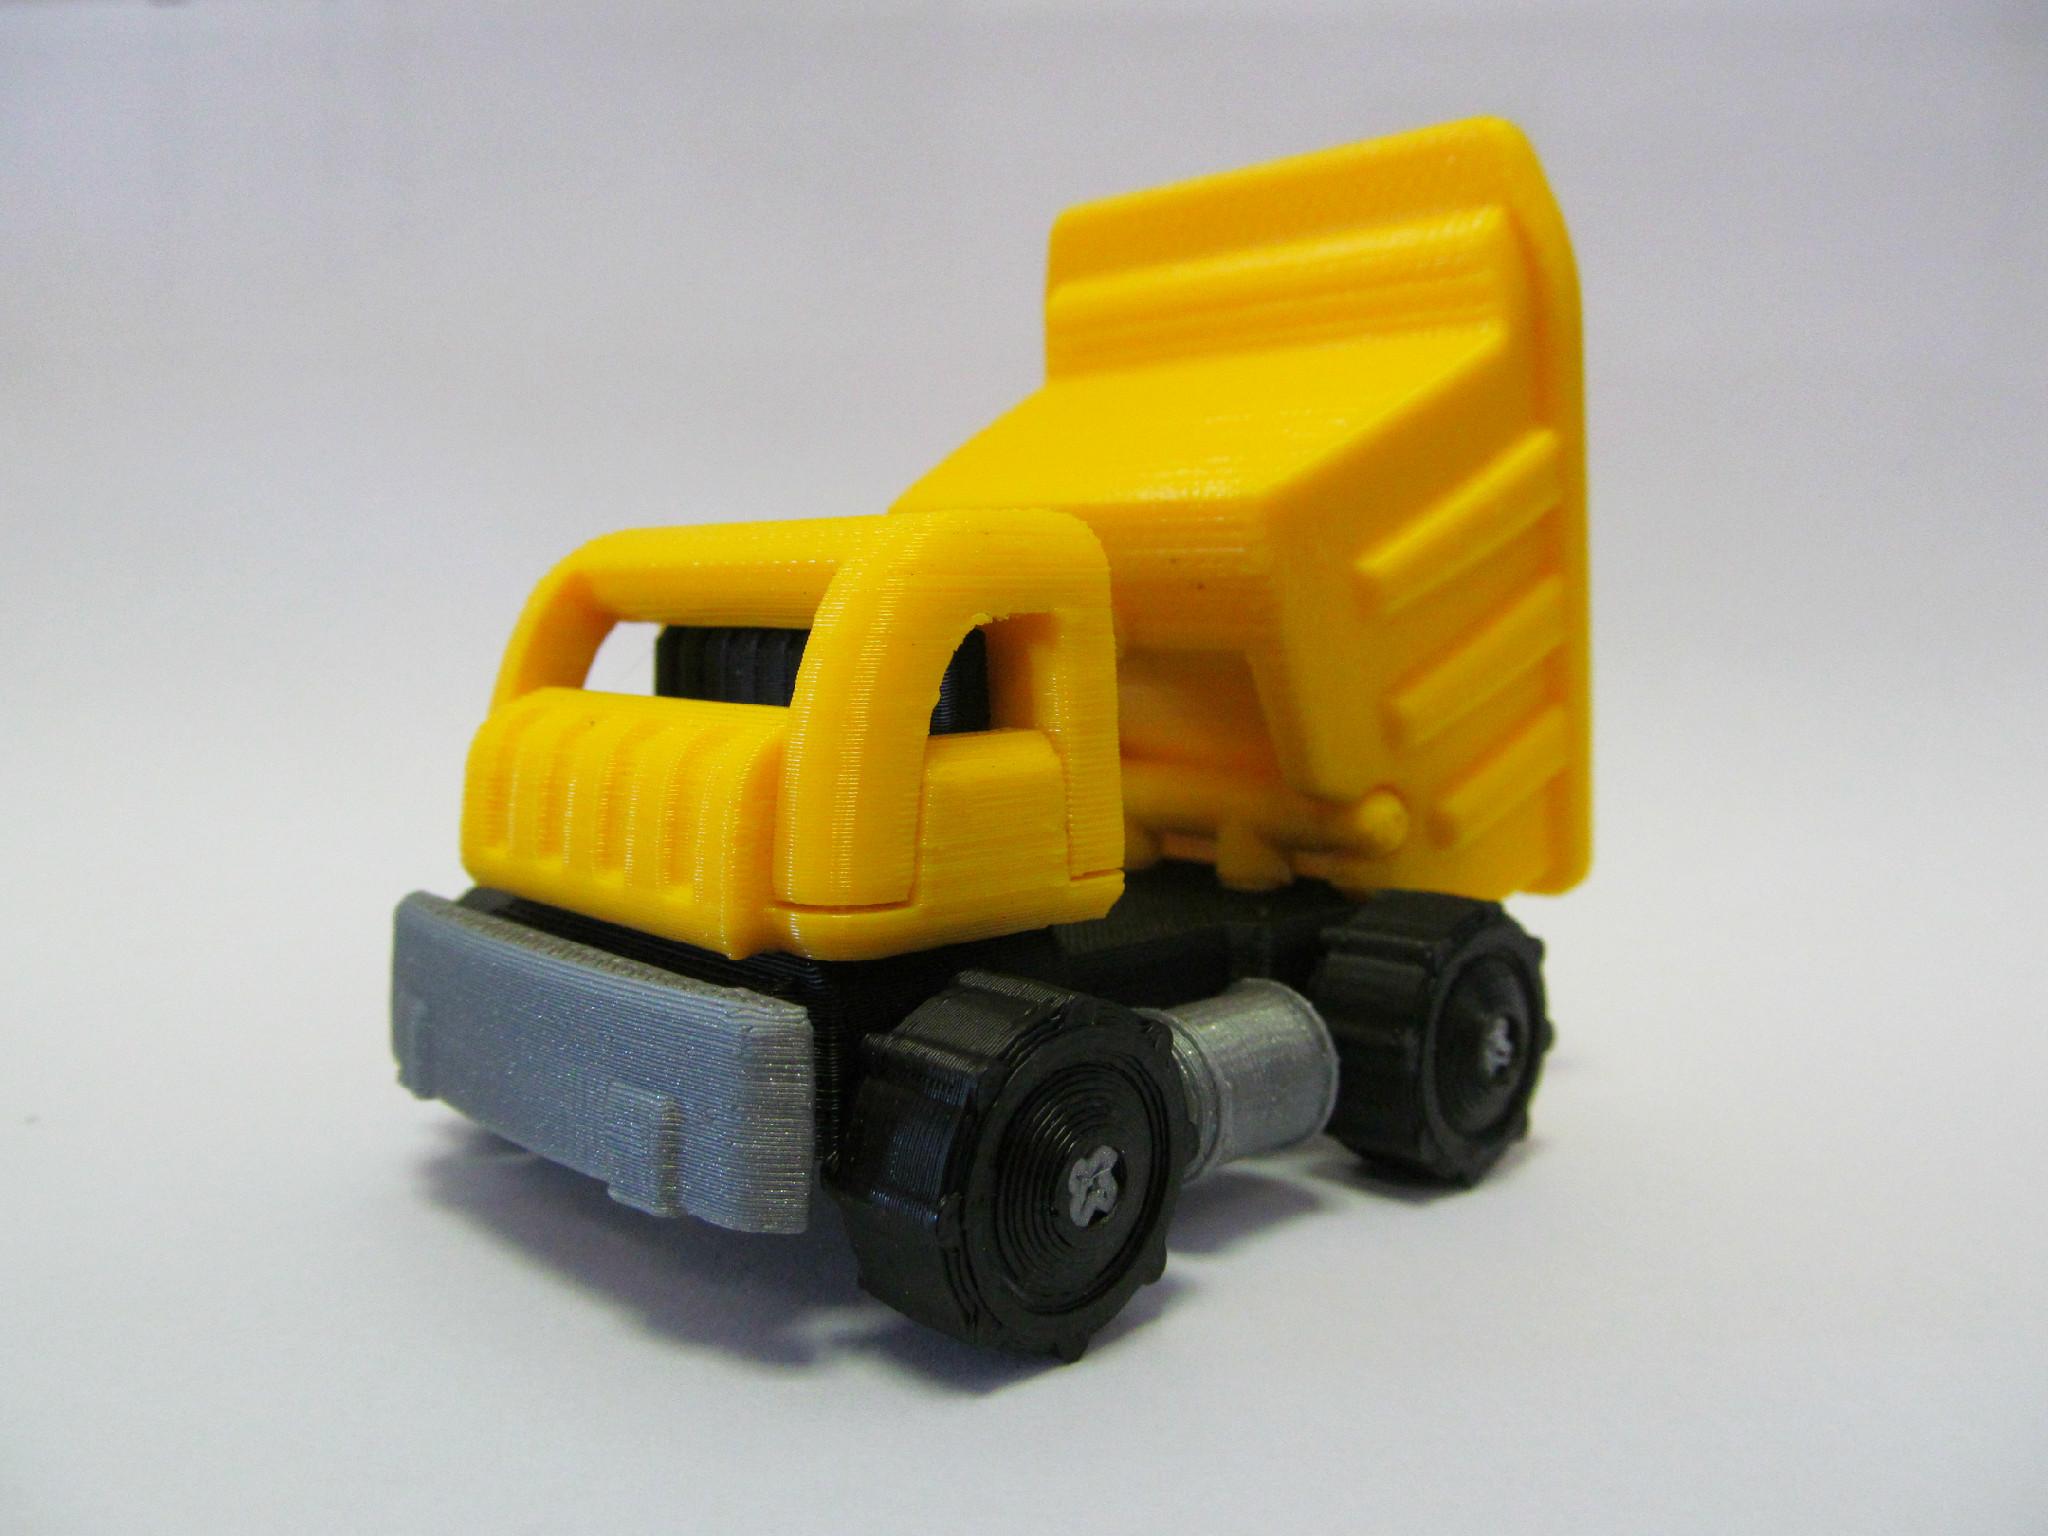 3D Printed Toy Truck Tilting.jpg